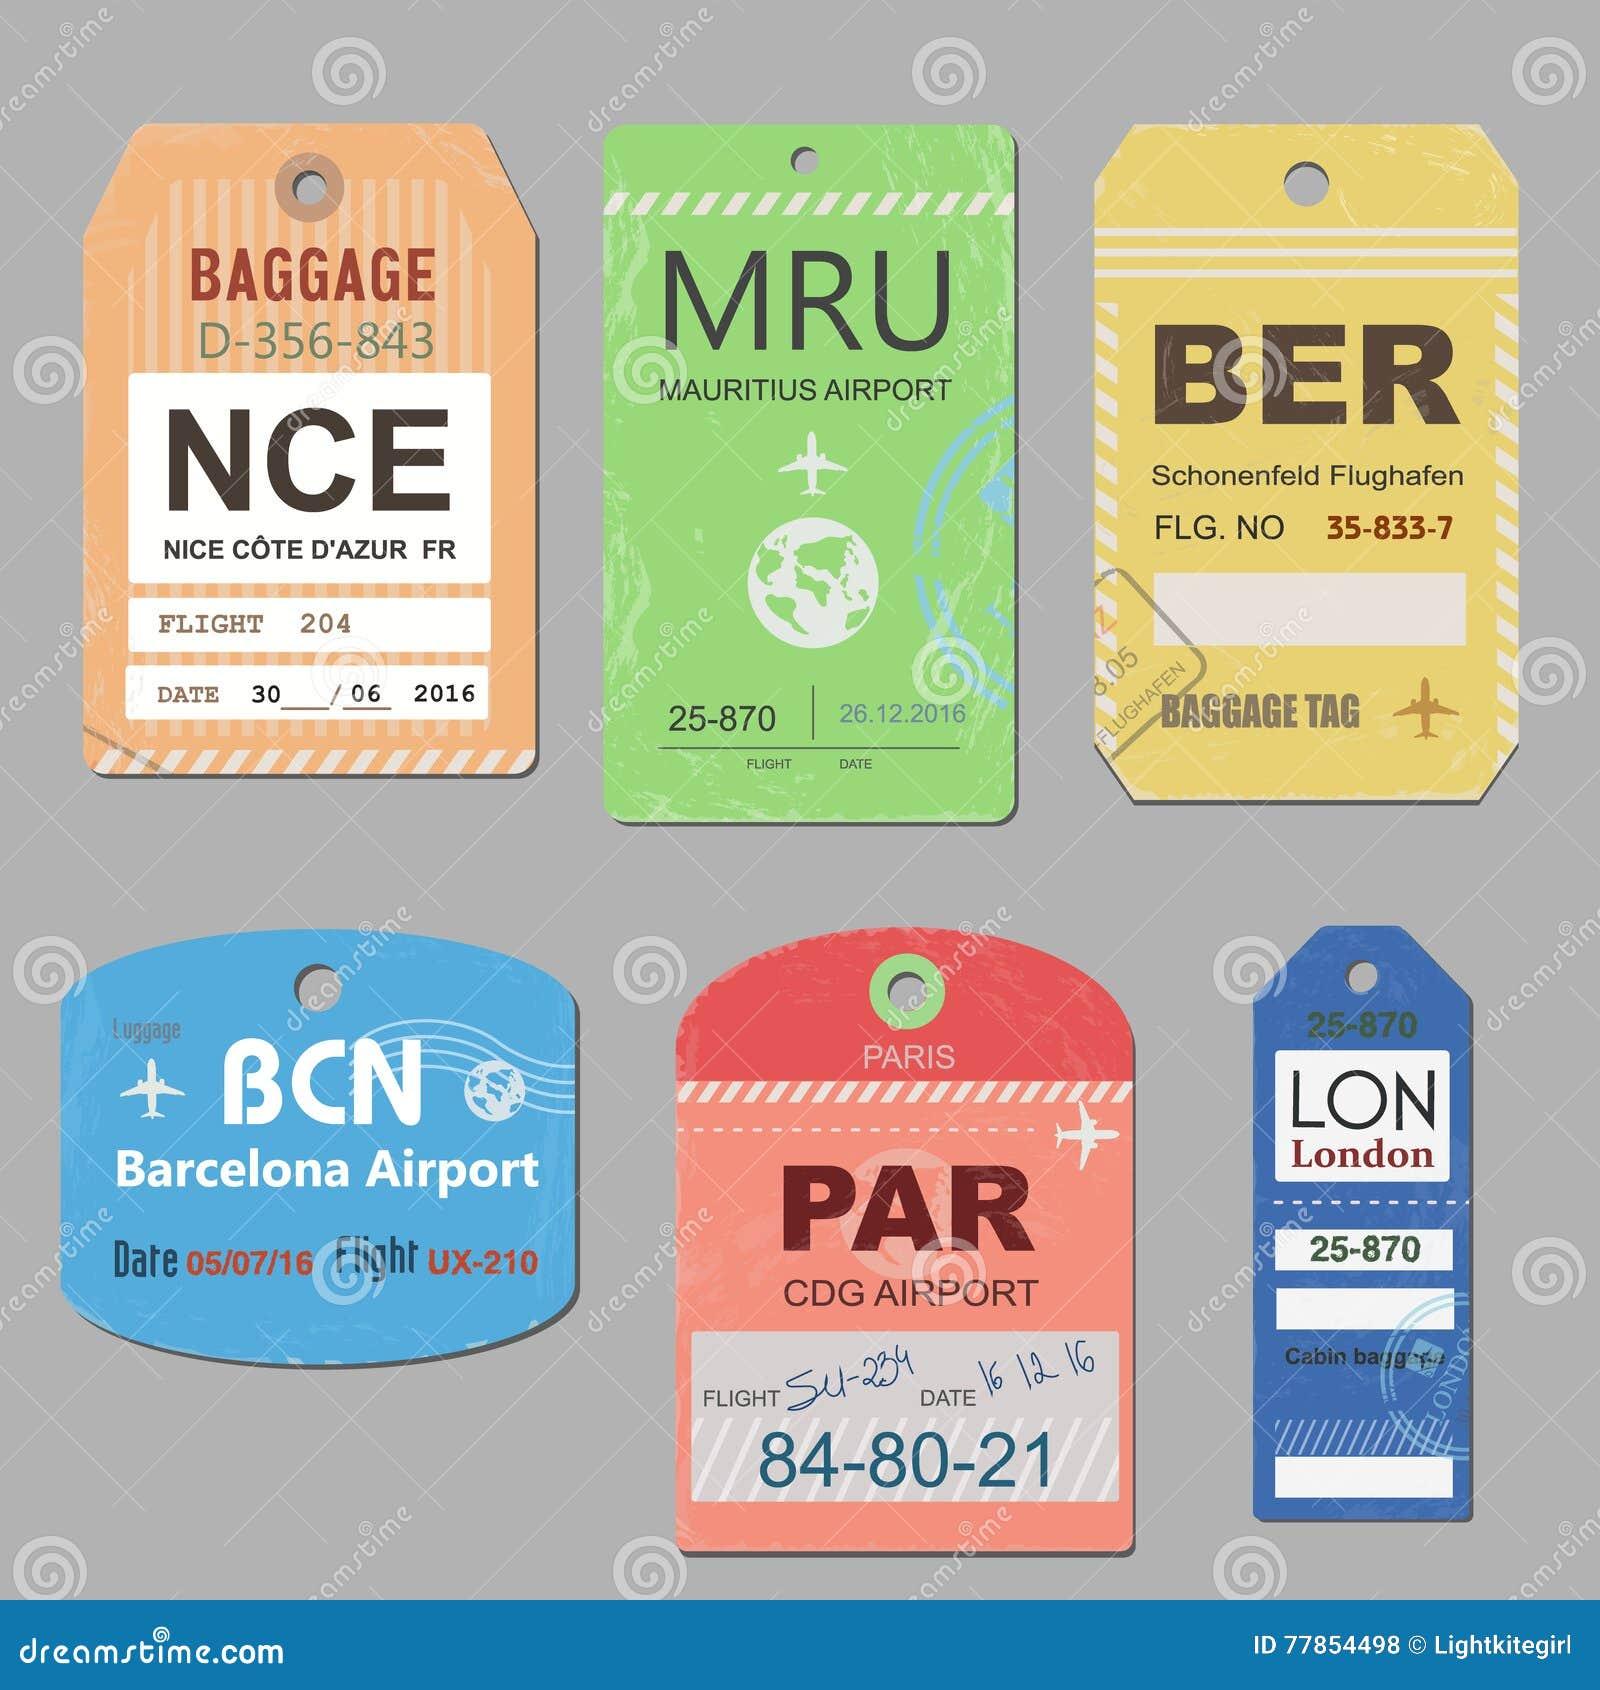 Vintage Travel Luggage Tags Vector. Retro Baggage Tag Illustration ...